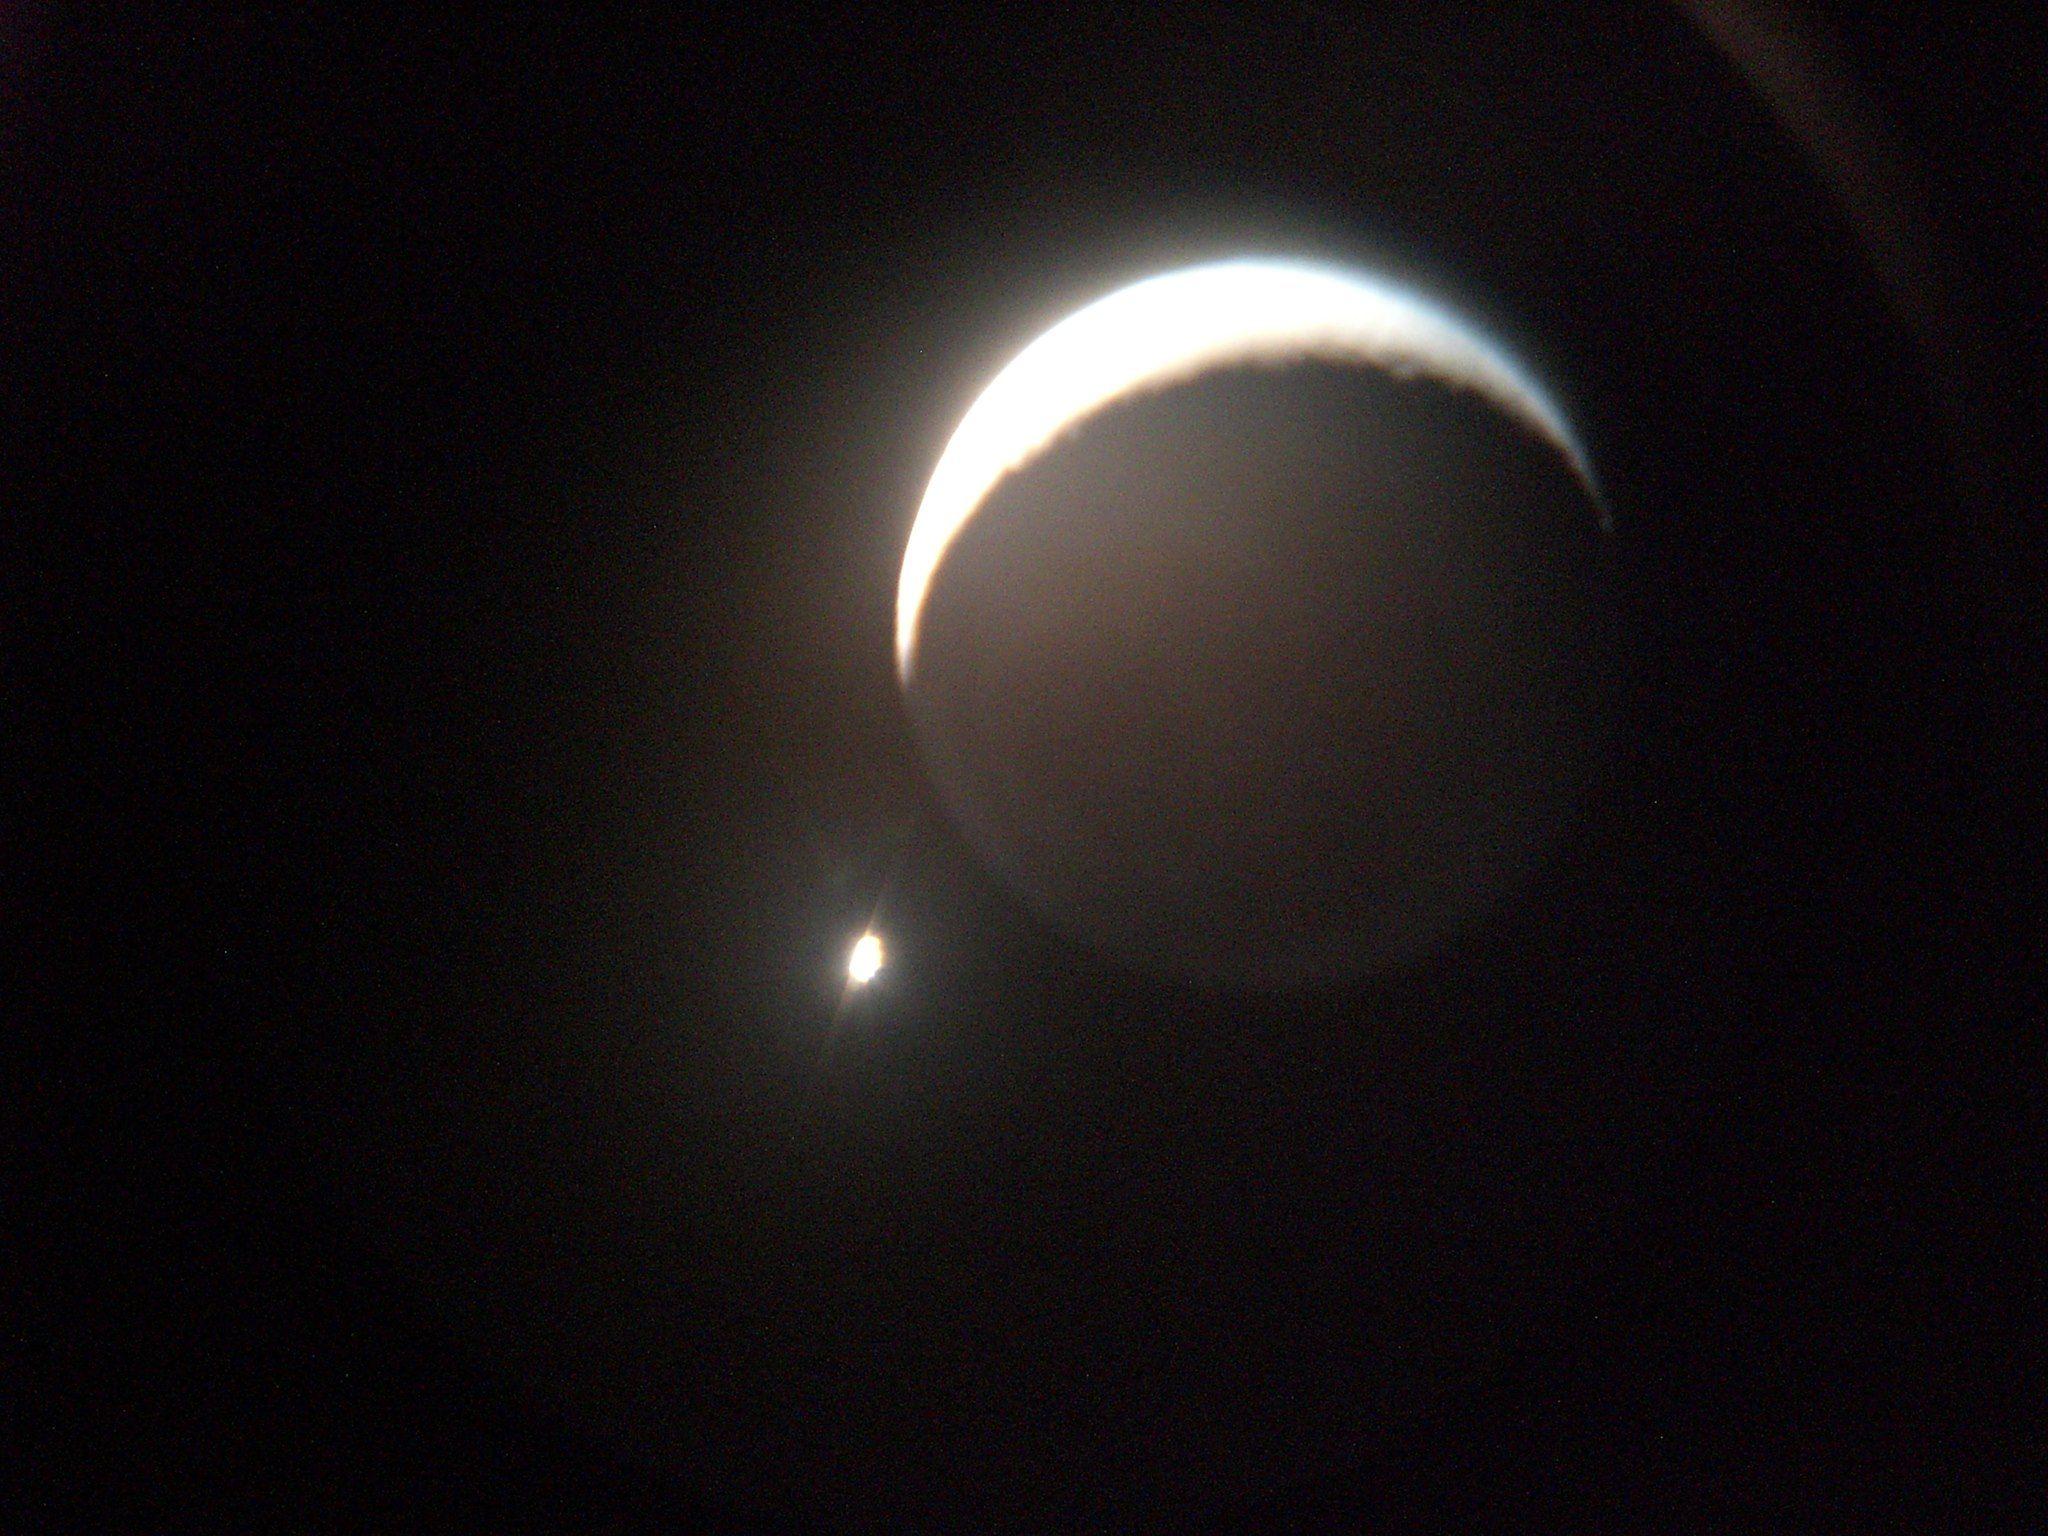 Conjunção Vênus Lua / Conjunction Moon Venus. Ponta Grossa - PR, Brasil, 08 set 2013. (Everton Poluha)  (http://www.facebook.com/photo.php?fbid=10201295564305609)